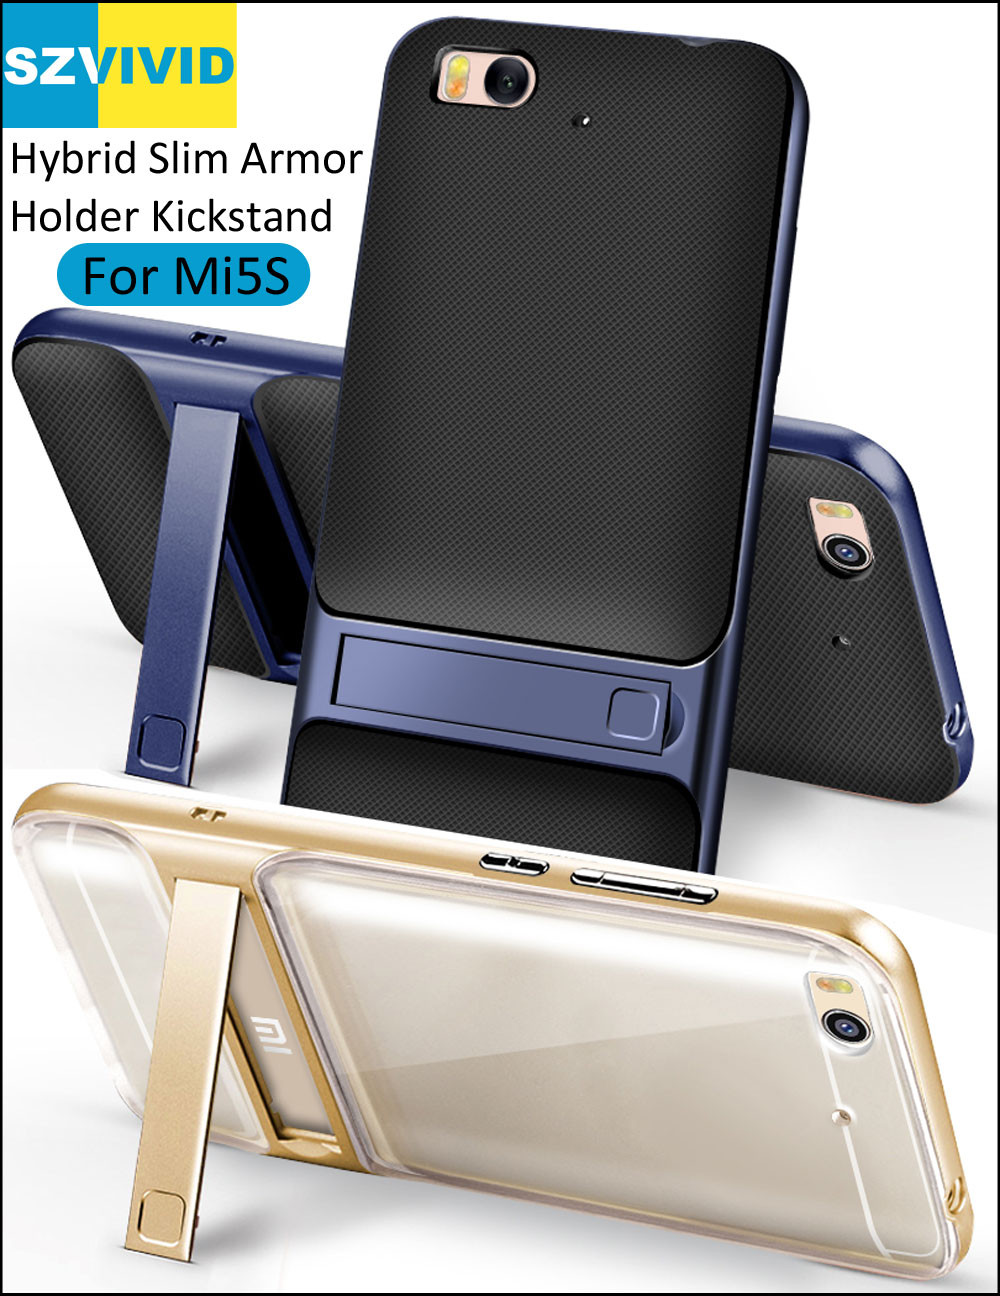 Stand Holder Kickstand Case for Xiaomi Mi5S Hybrid Slim Armor Protector Cover Mi 5S